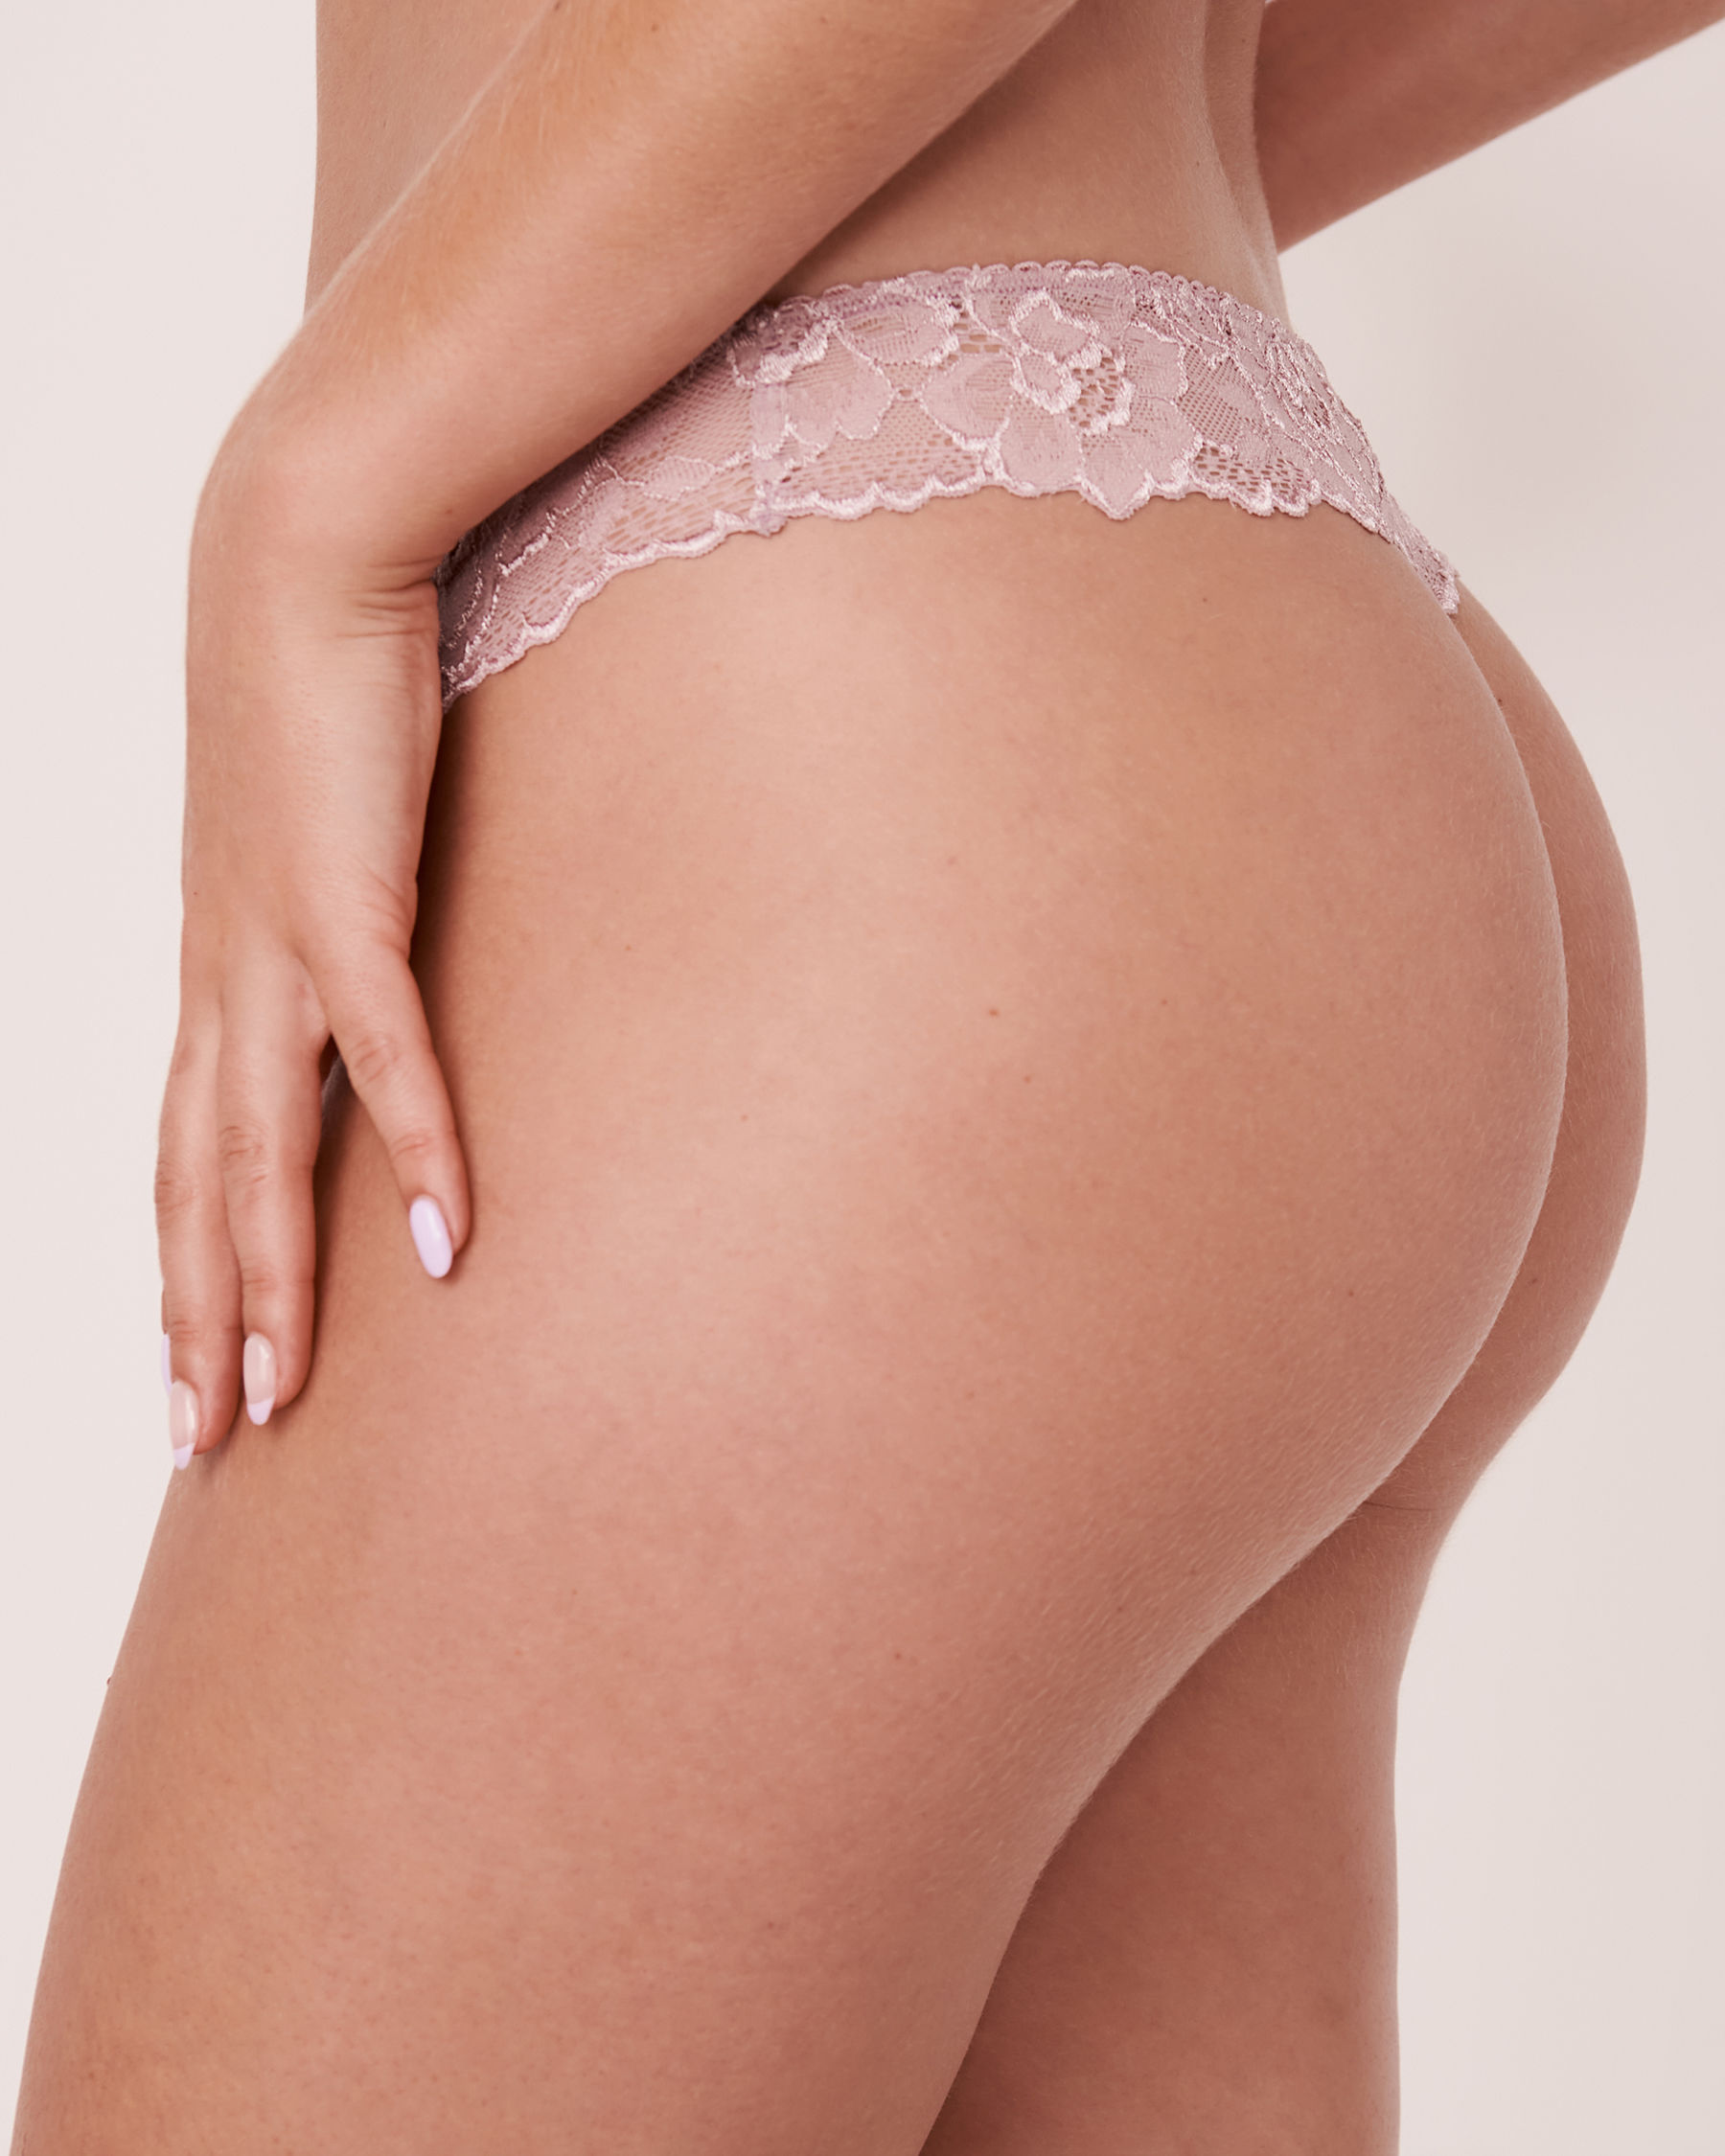 LA VIE EN ROSE Thong Panty Pink shadows 20200066 - View2